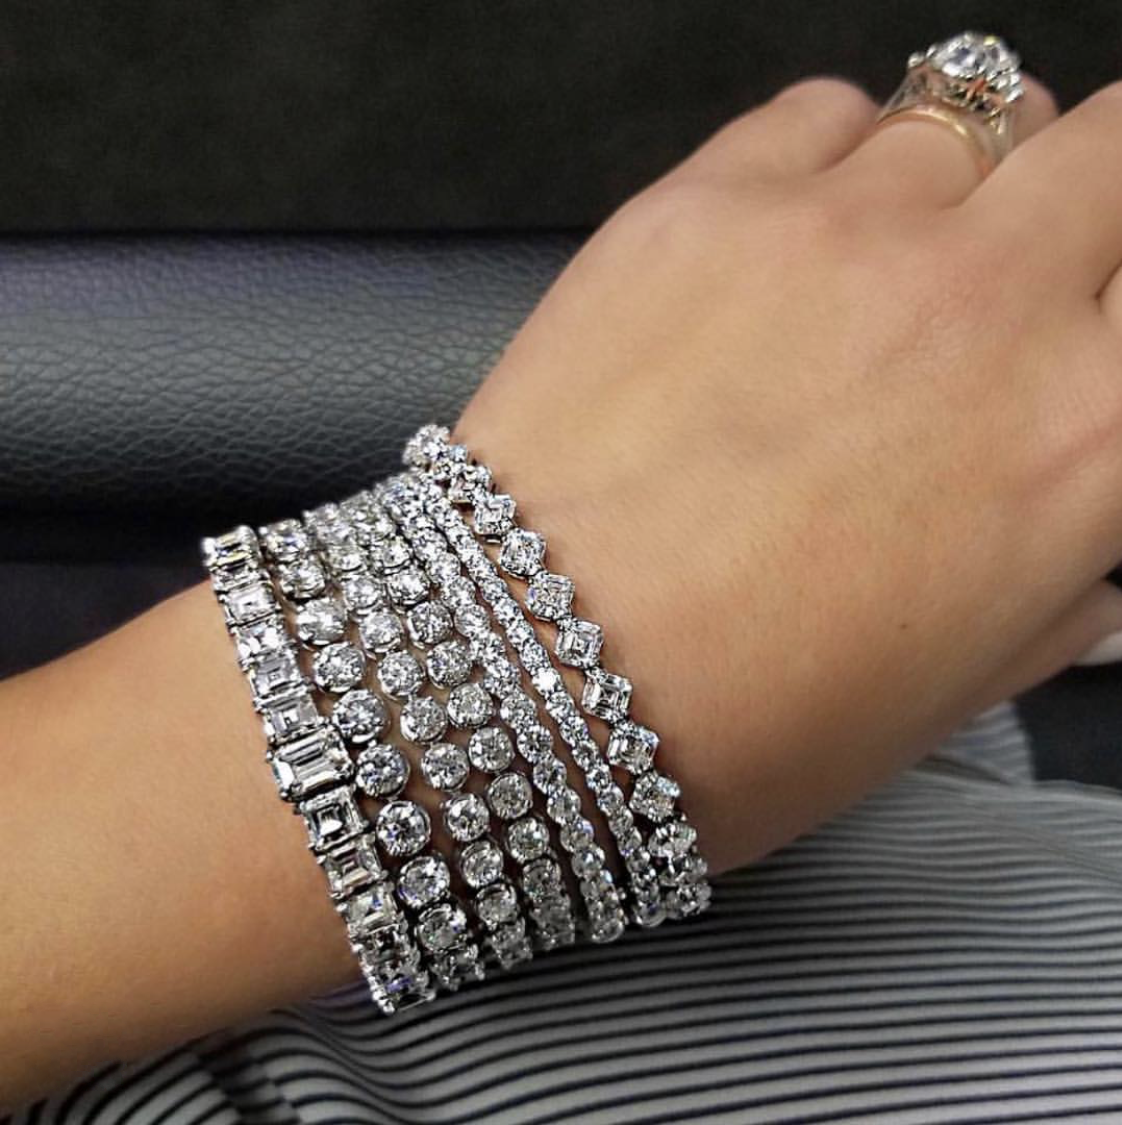 4mm Round Moissanite Diamond Bracelets